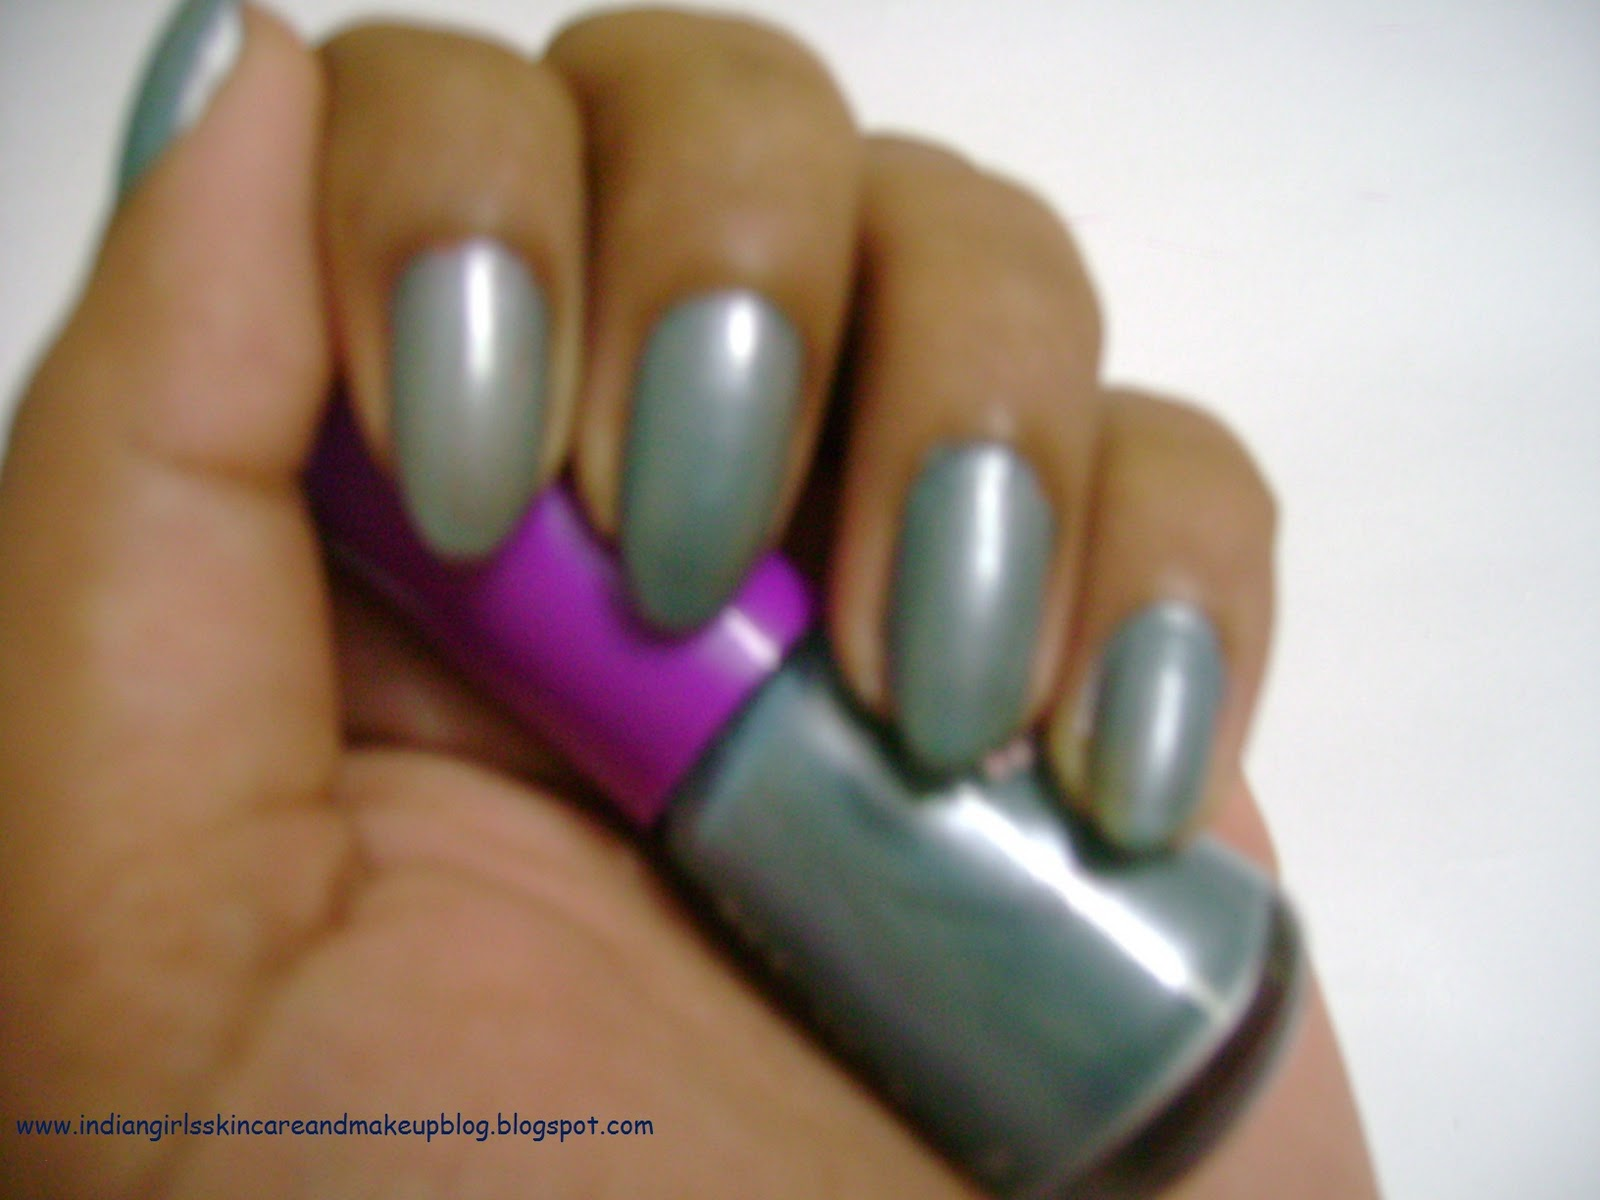 Beauty Angels: Avon Simply Pretty Nail Polish - Frosty Blue -NOTD